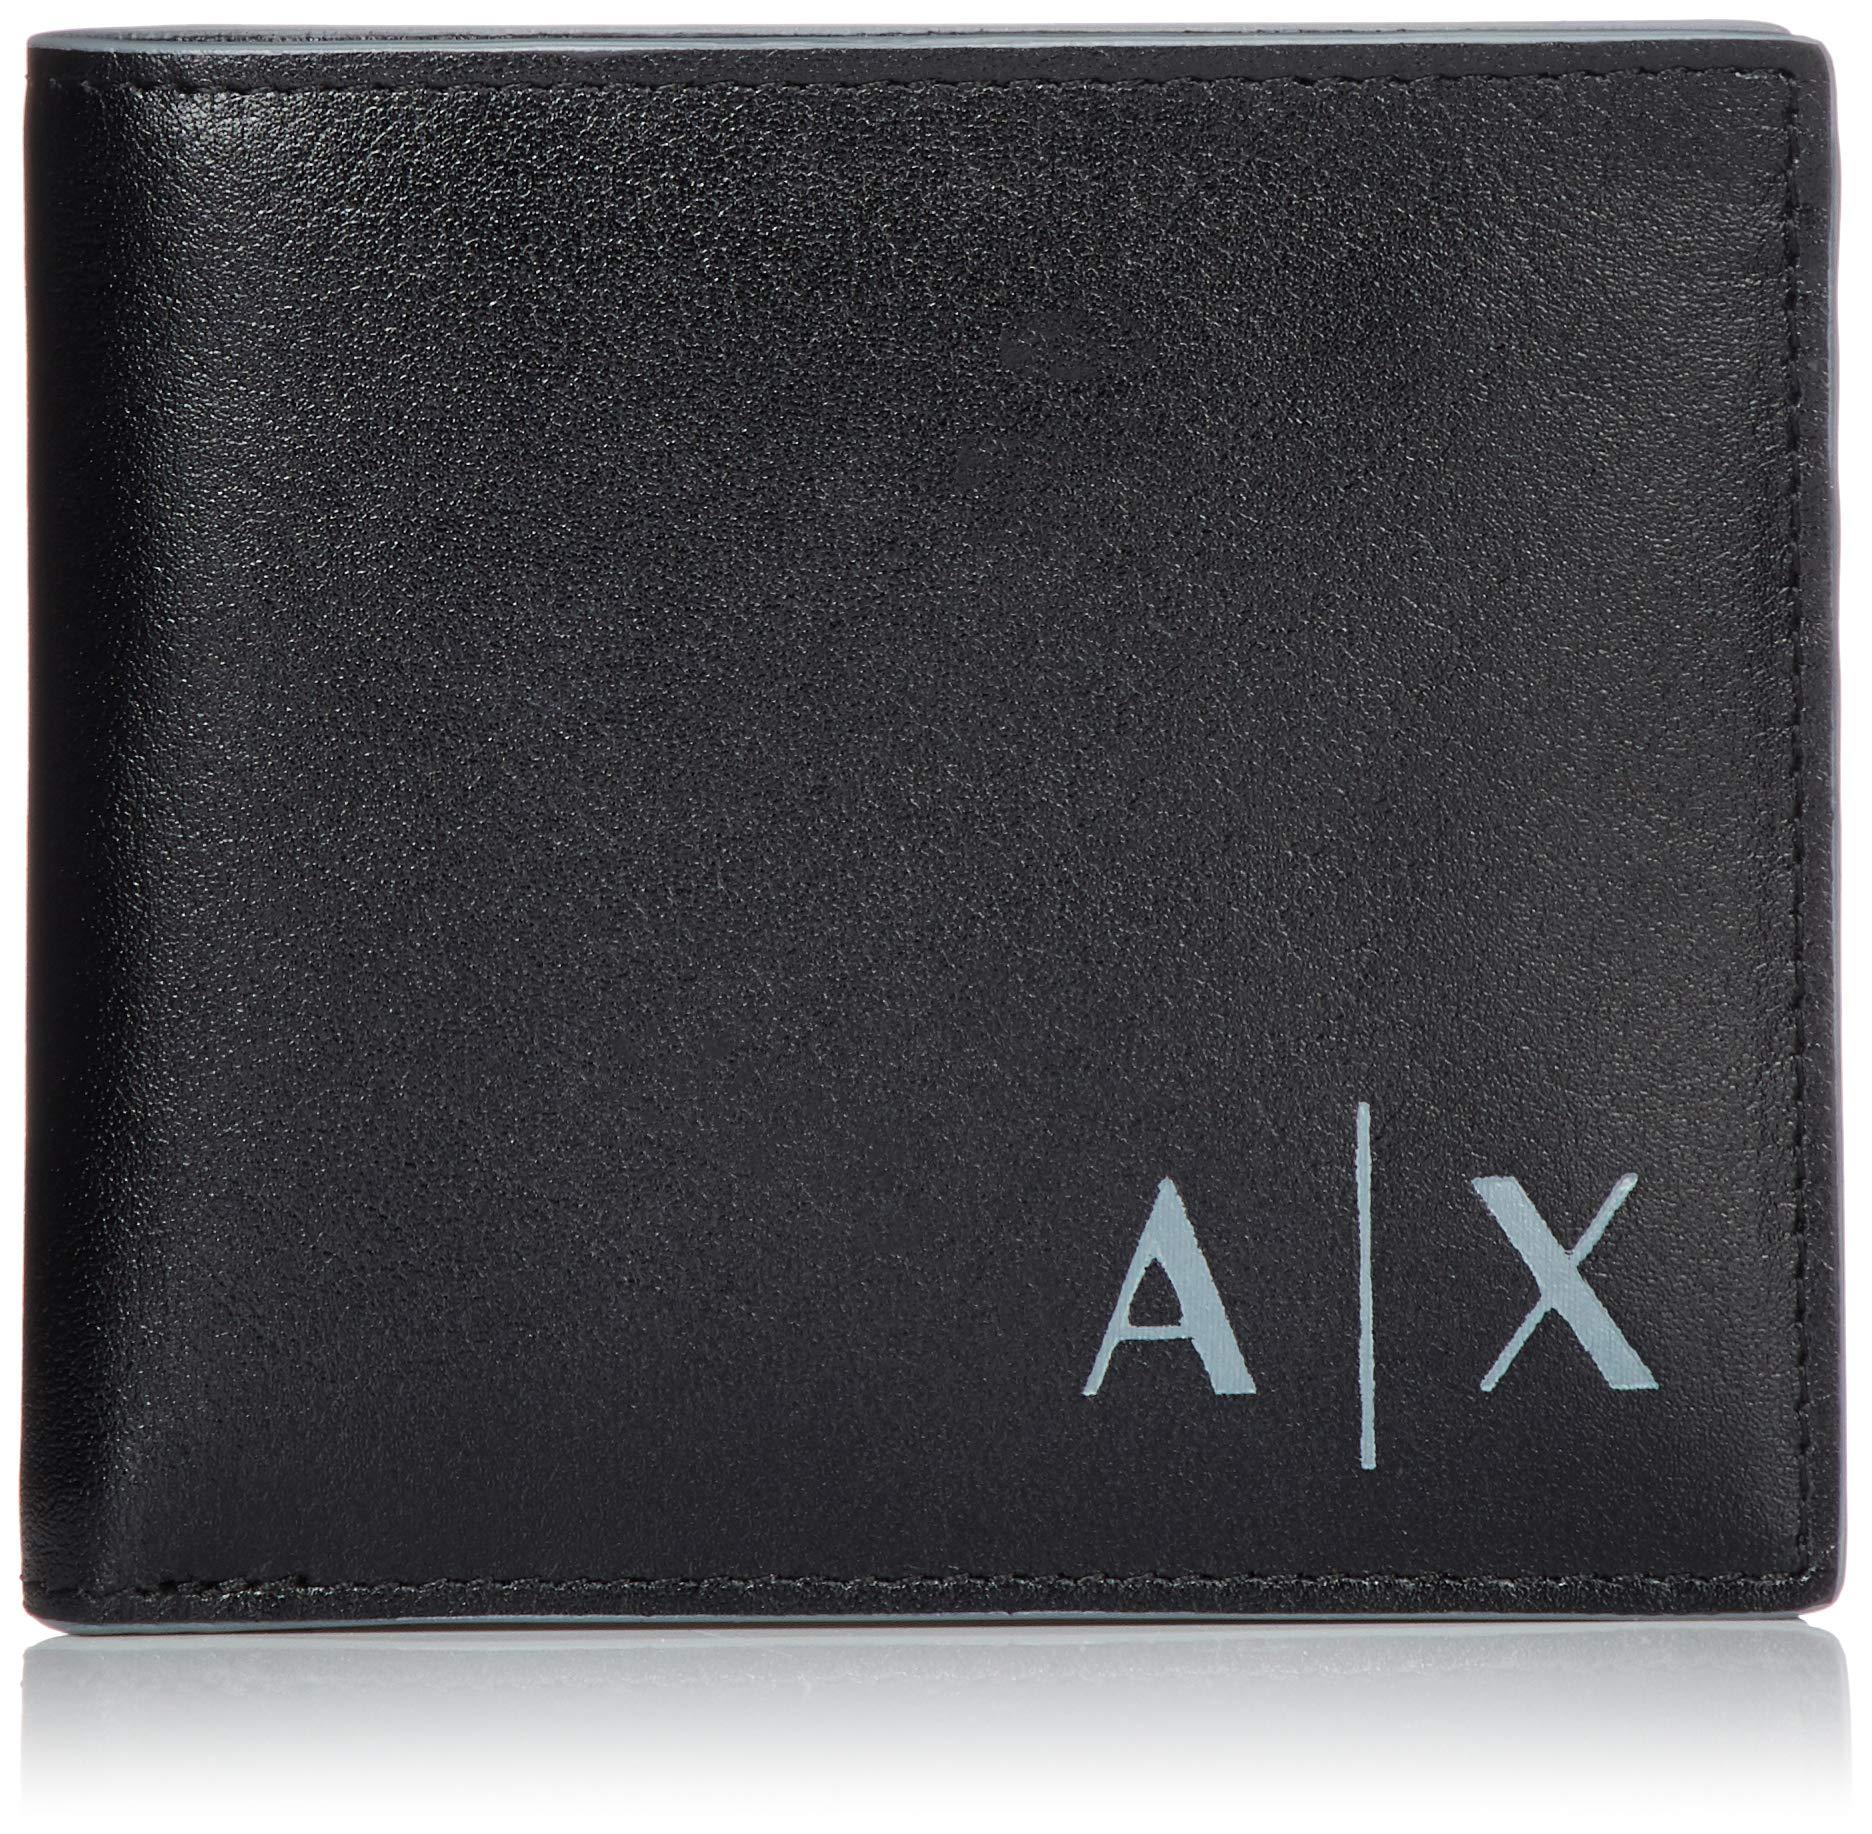 Cmb Exchange H T CardPortefeuilles X 5x11 HommeNoirblack10x1 Credit Armani 5 Logo erxBWdCo